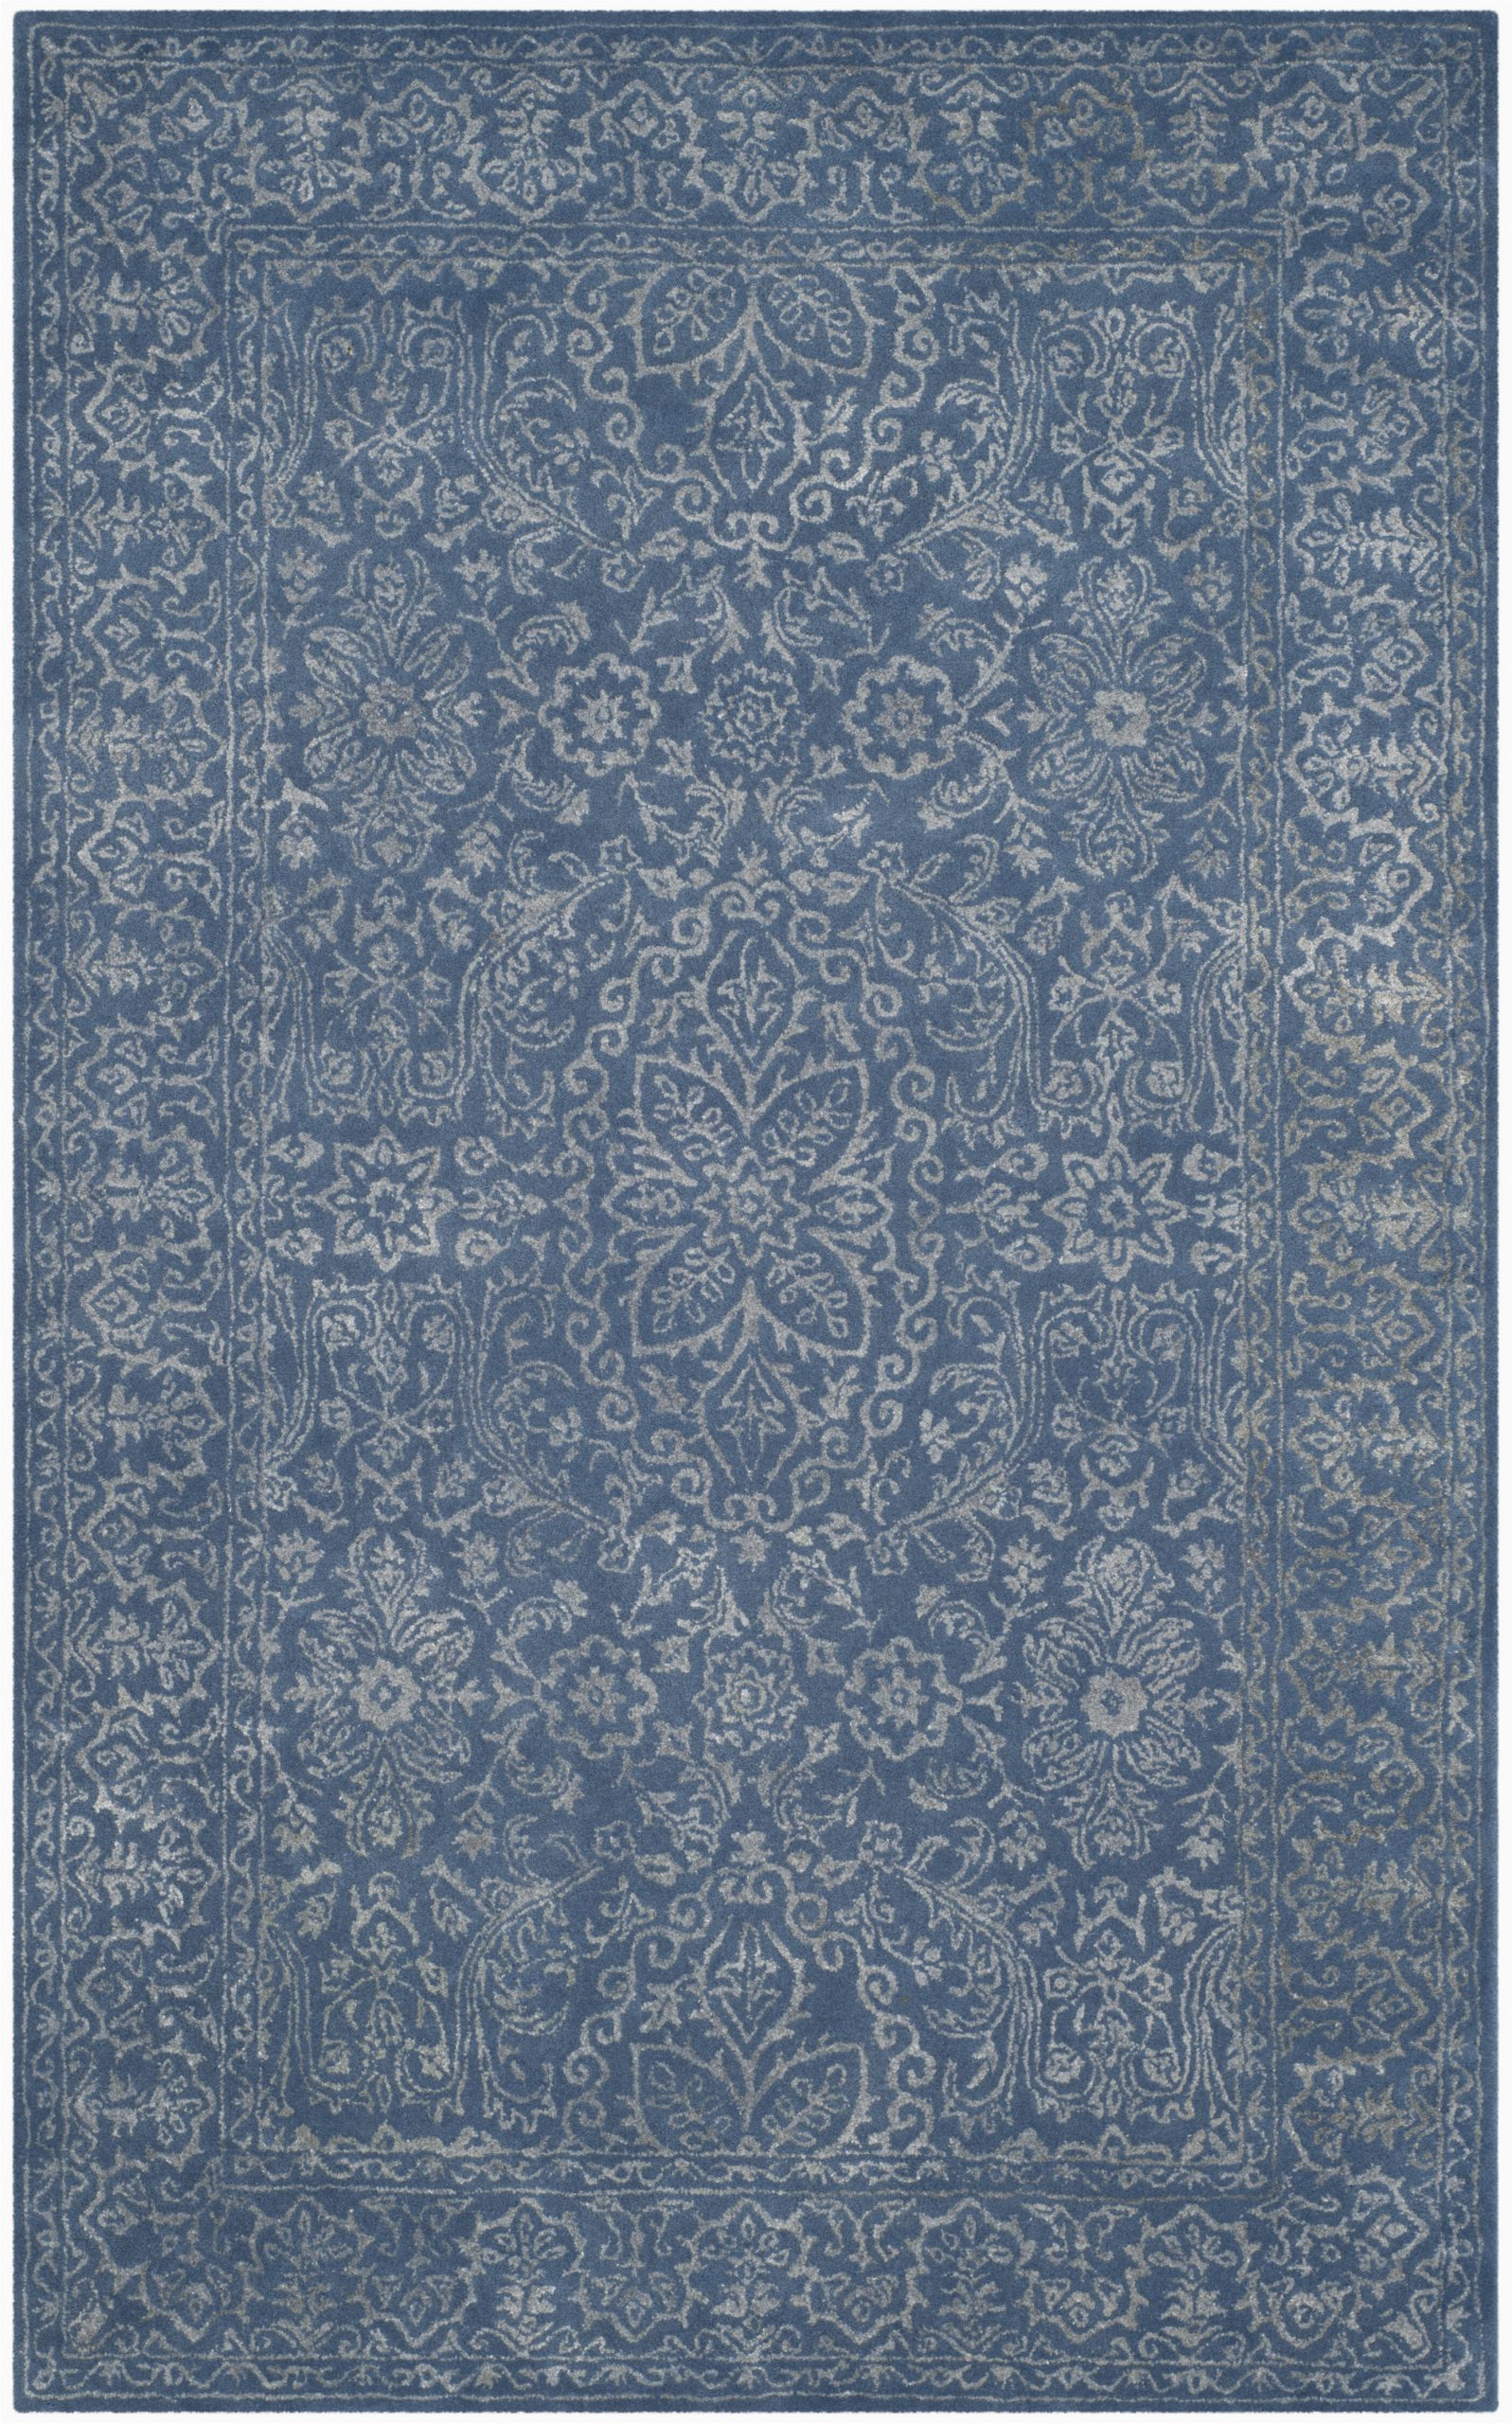 world menagerie wilkins hand tufted grayblue indoor area rug wrmg1790 domain=thespruce&cjevent=e e a &refID=CJ CJ &PID=CJ